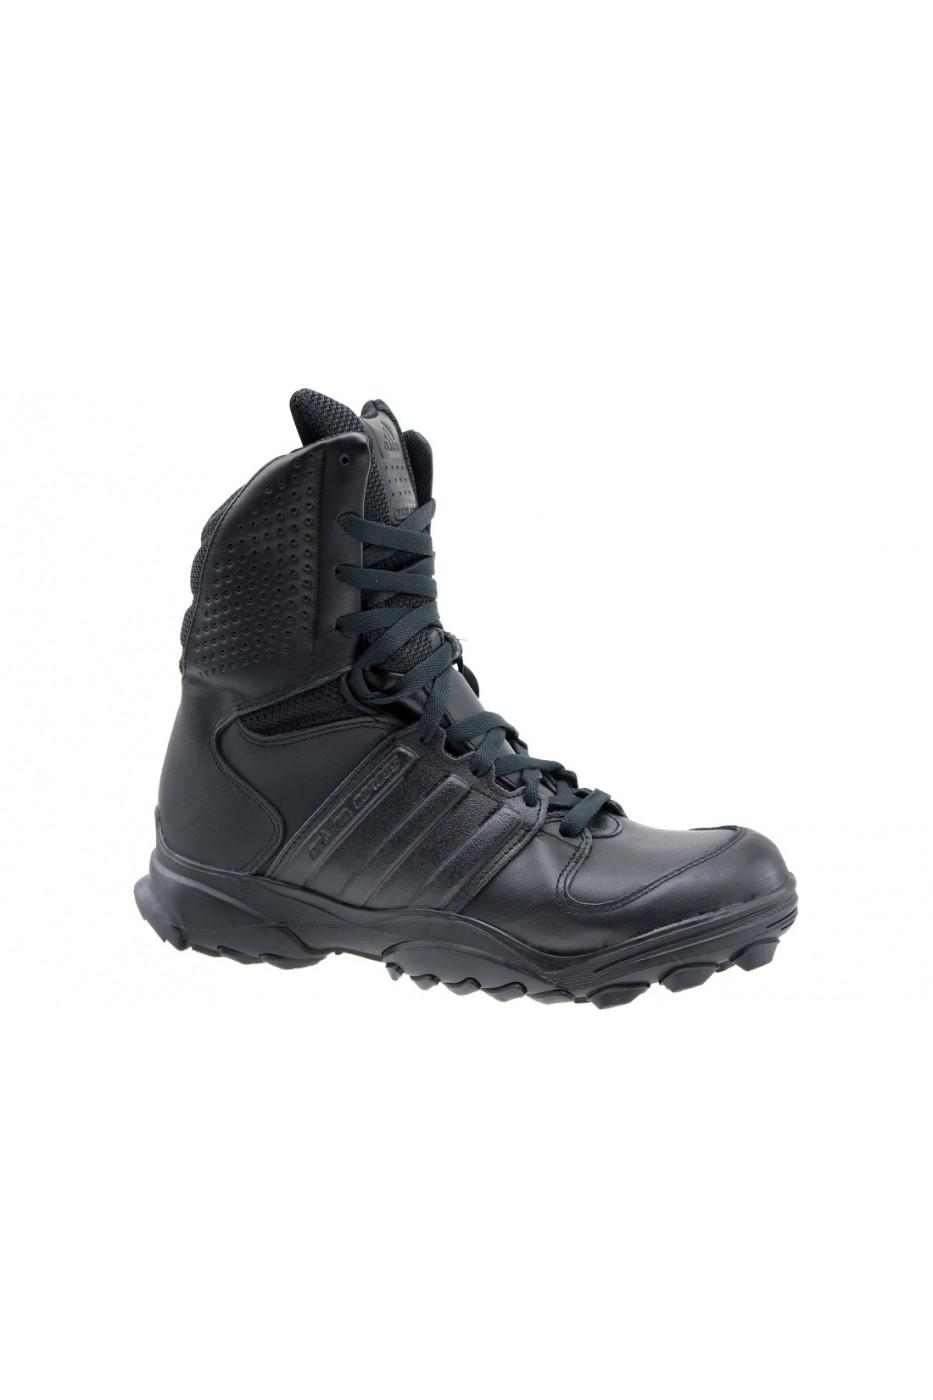 a9488bdd8a6b adidas Téli cipő-bakancs BUT-807295 - FashionUP!